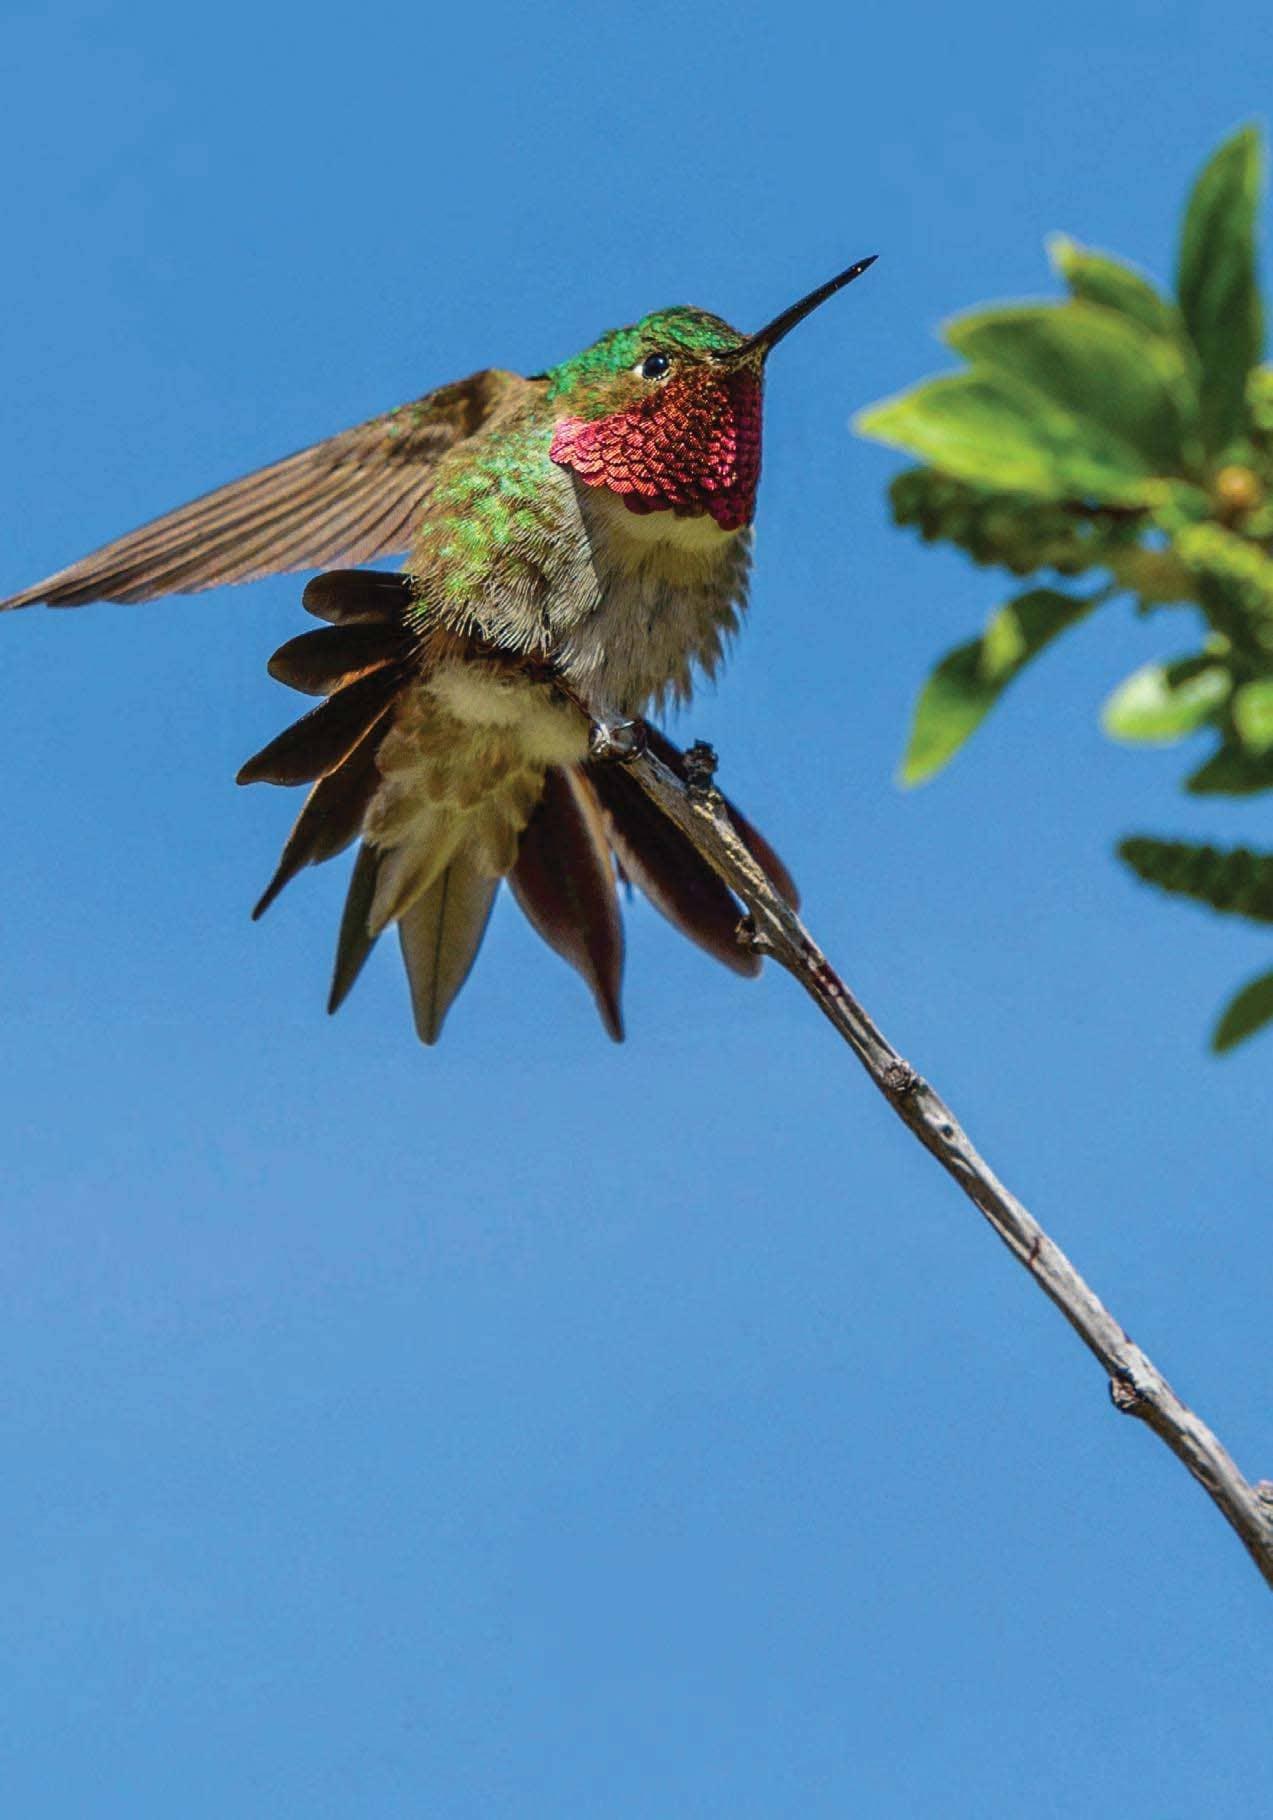 The Mountain Hummingbird